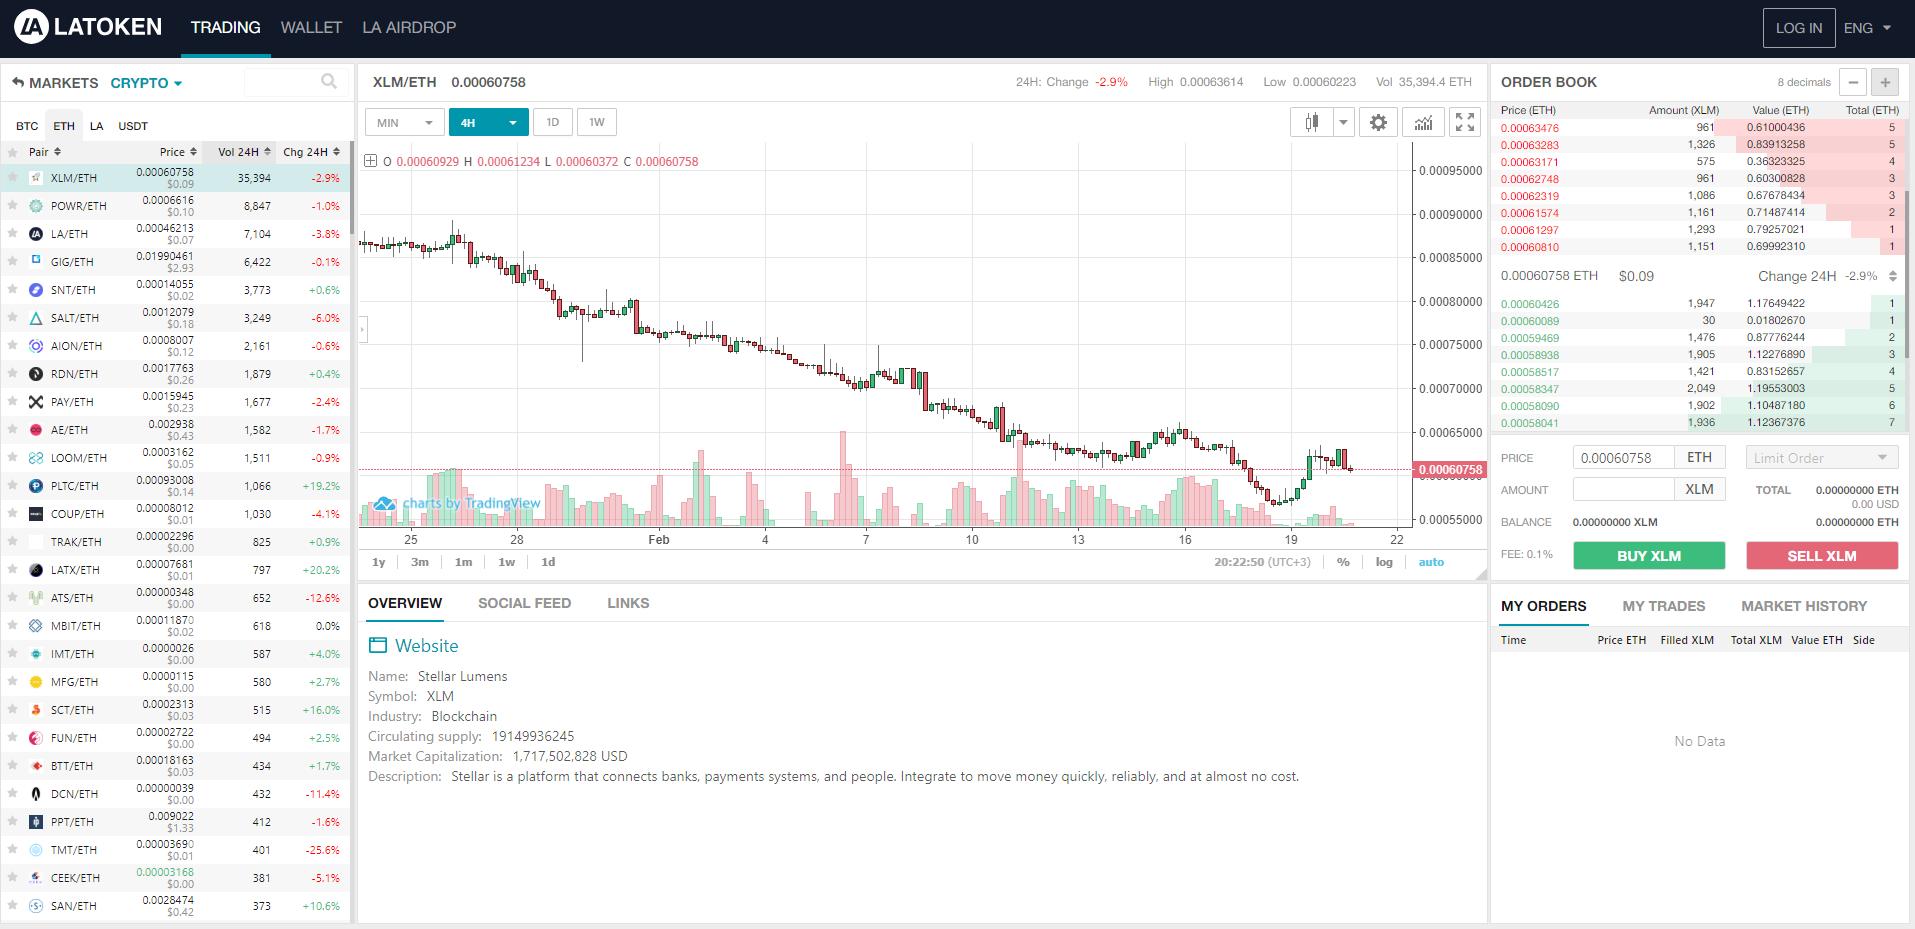 LATOKEN Trading View